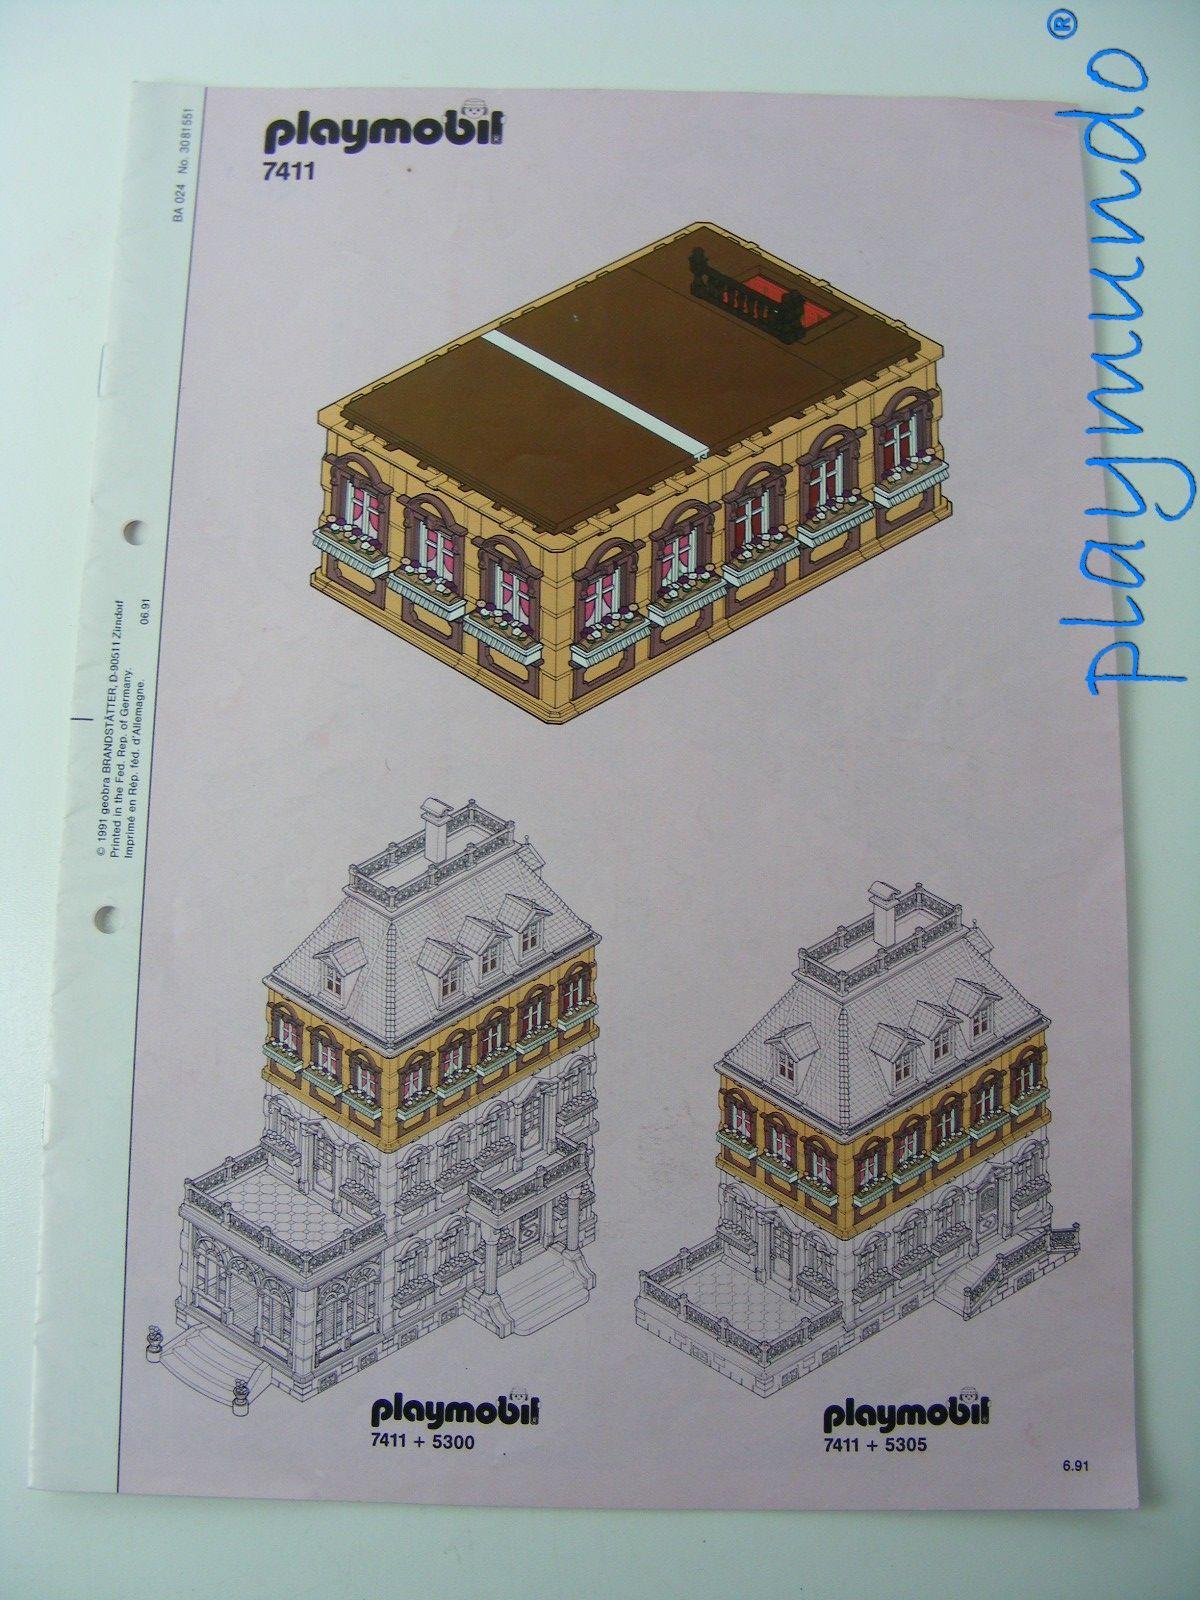 PLAYMOBIL 7411 MANUAL PISO CASA VICTORIA (COMPLEMENTO REF. 5300)